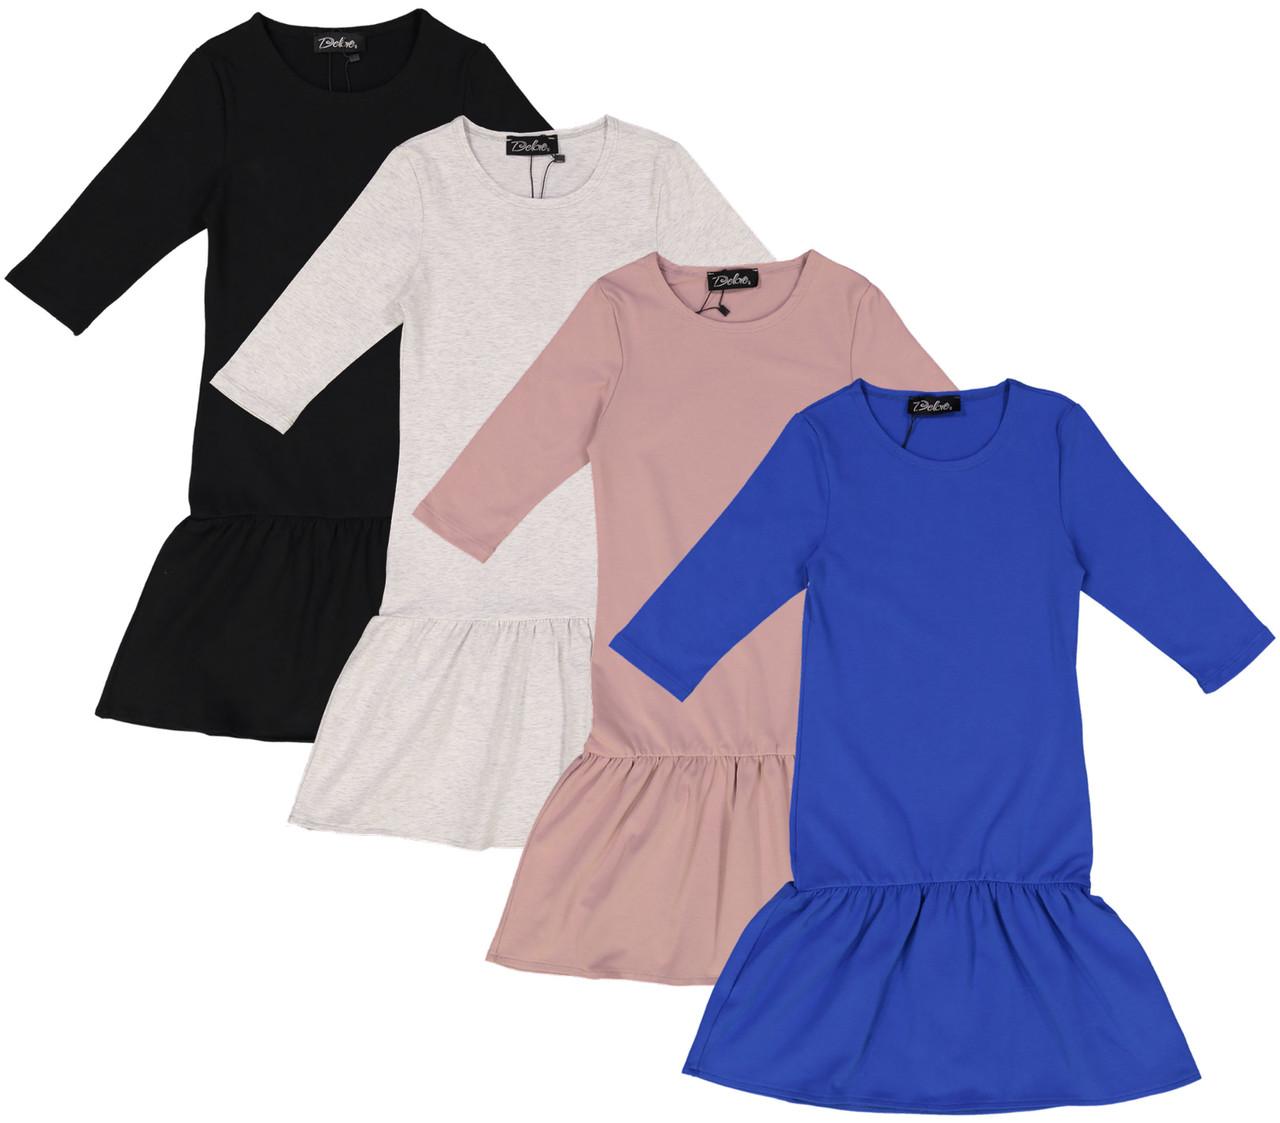 Delore Girls Cotton Dress